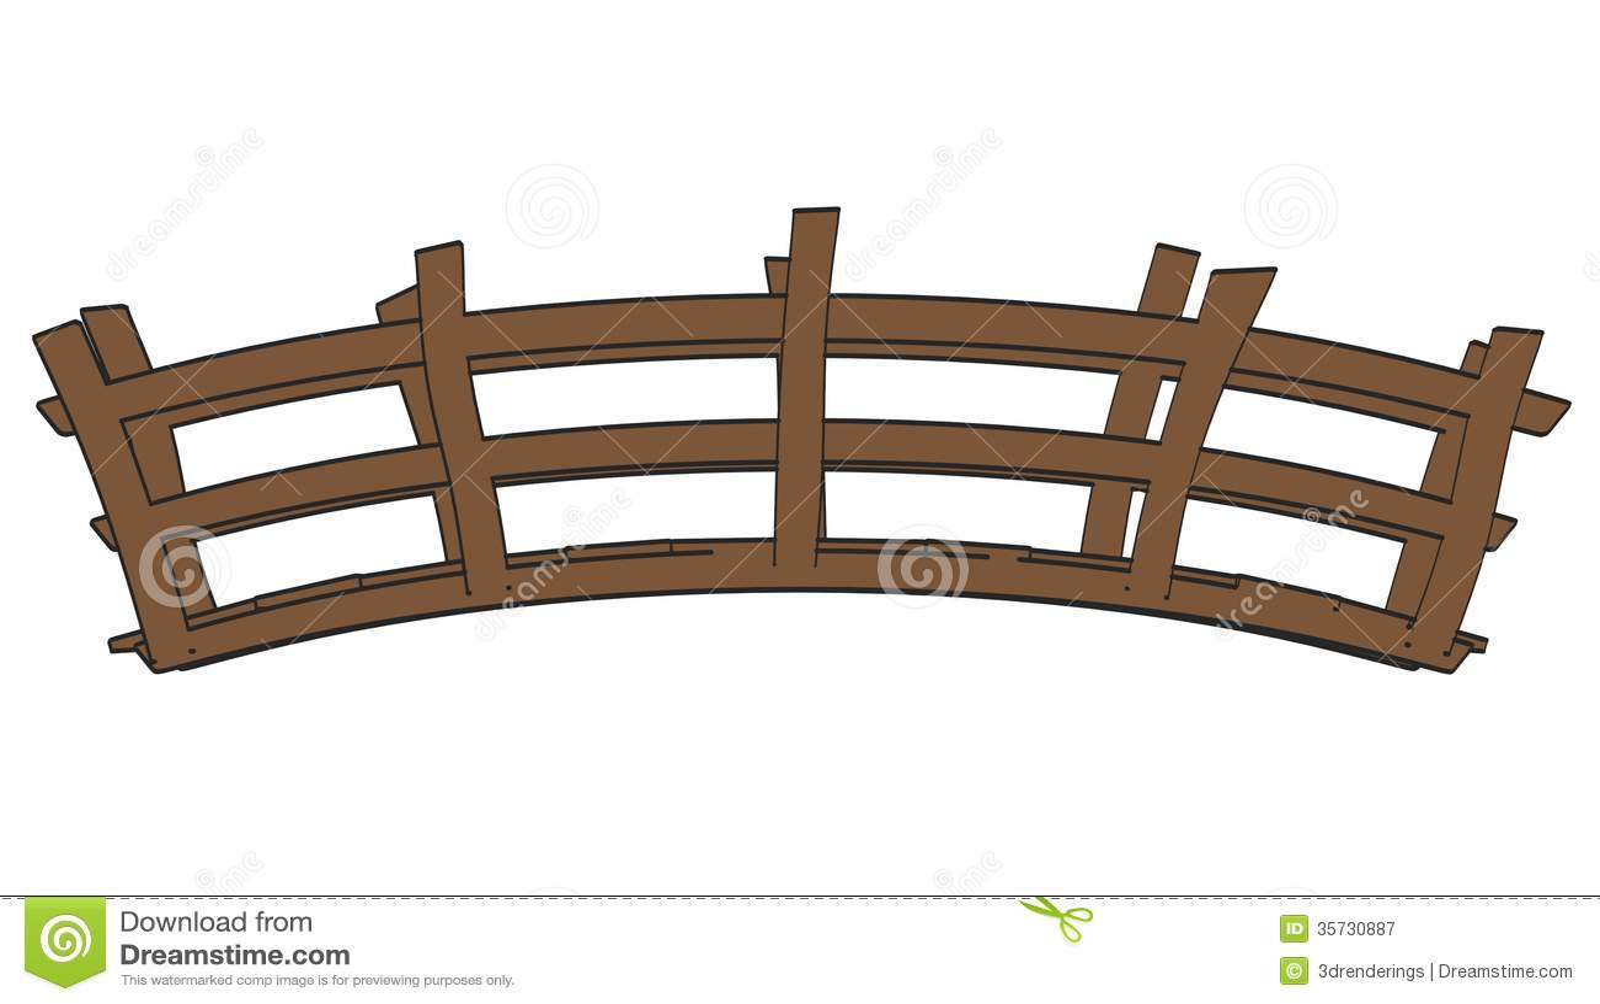 Wooden Arch Bridge Clipart Wooden bridge royalty free